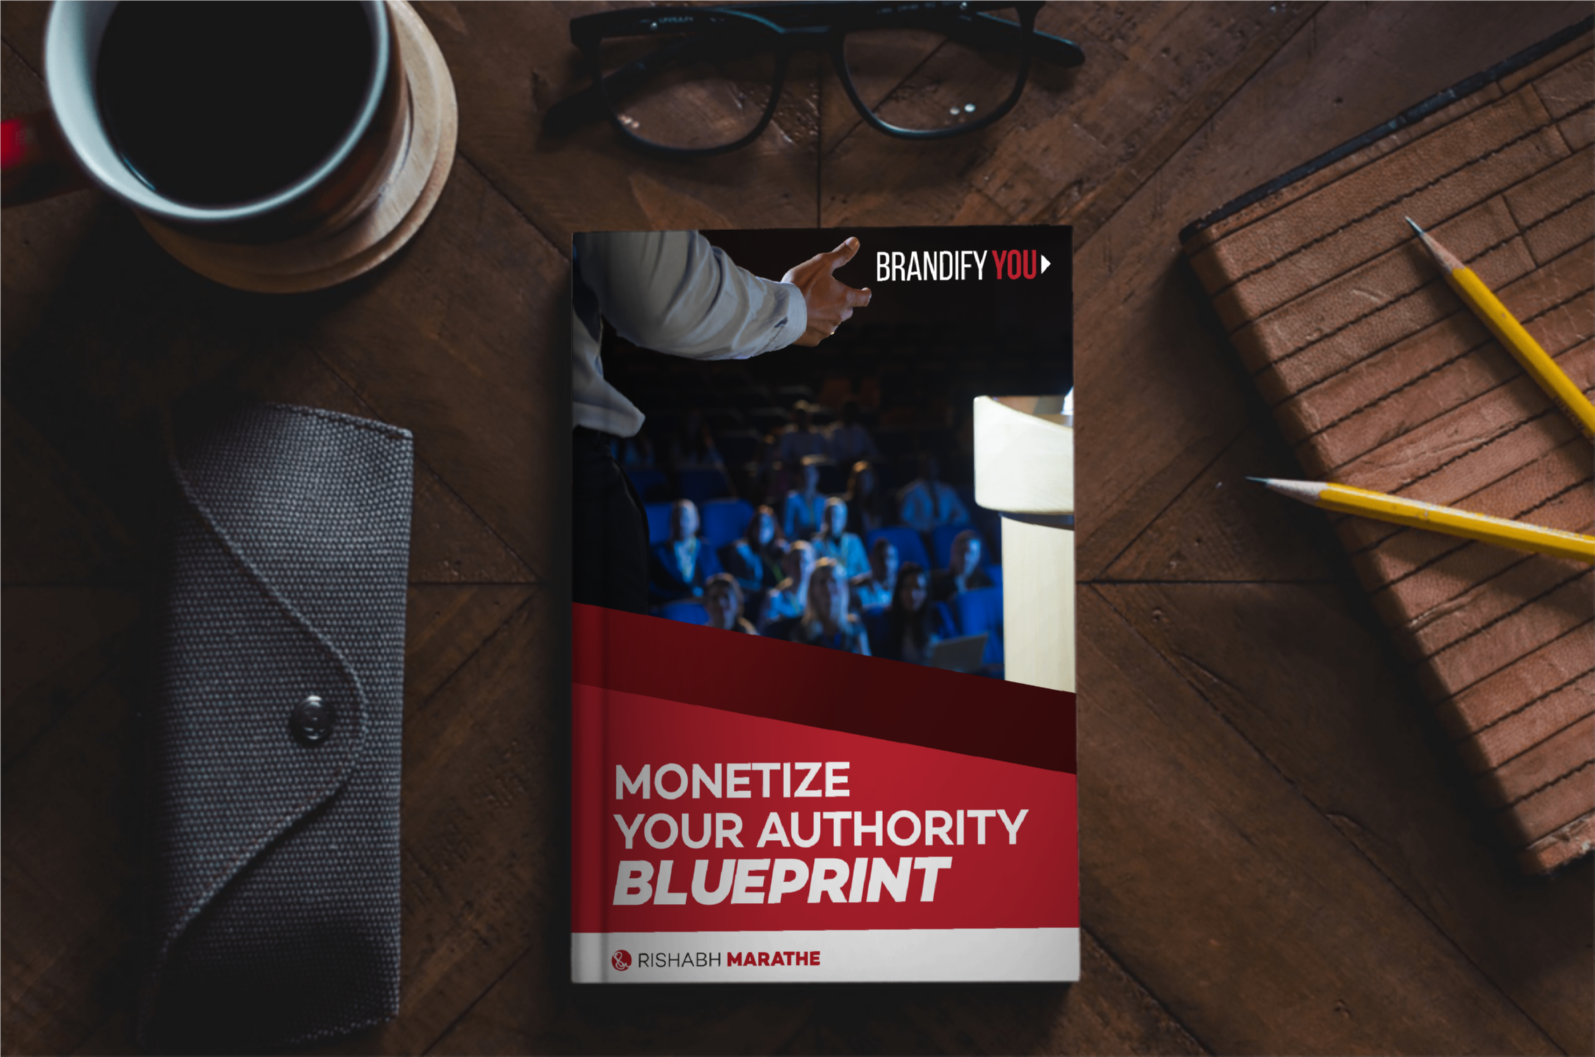 Monetize Your Authority Blueprint